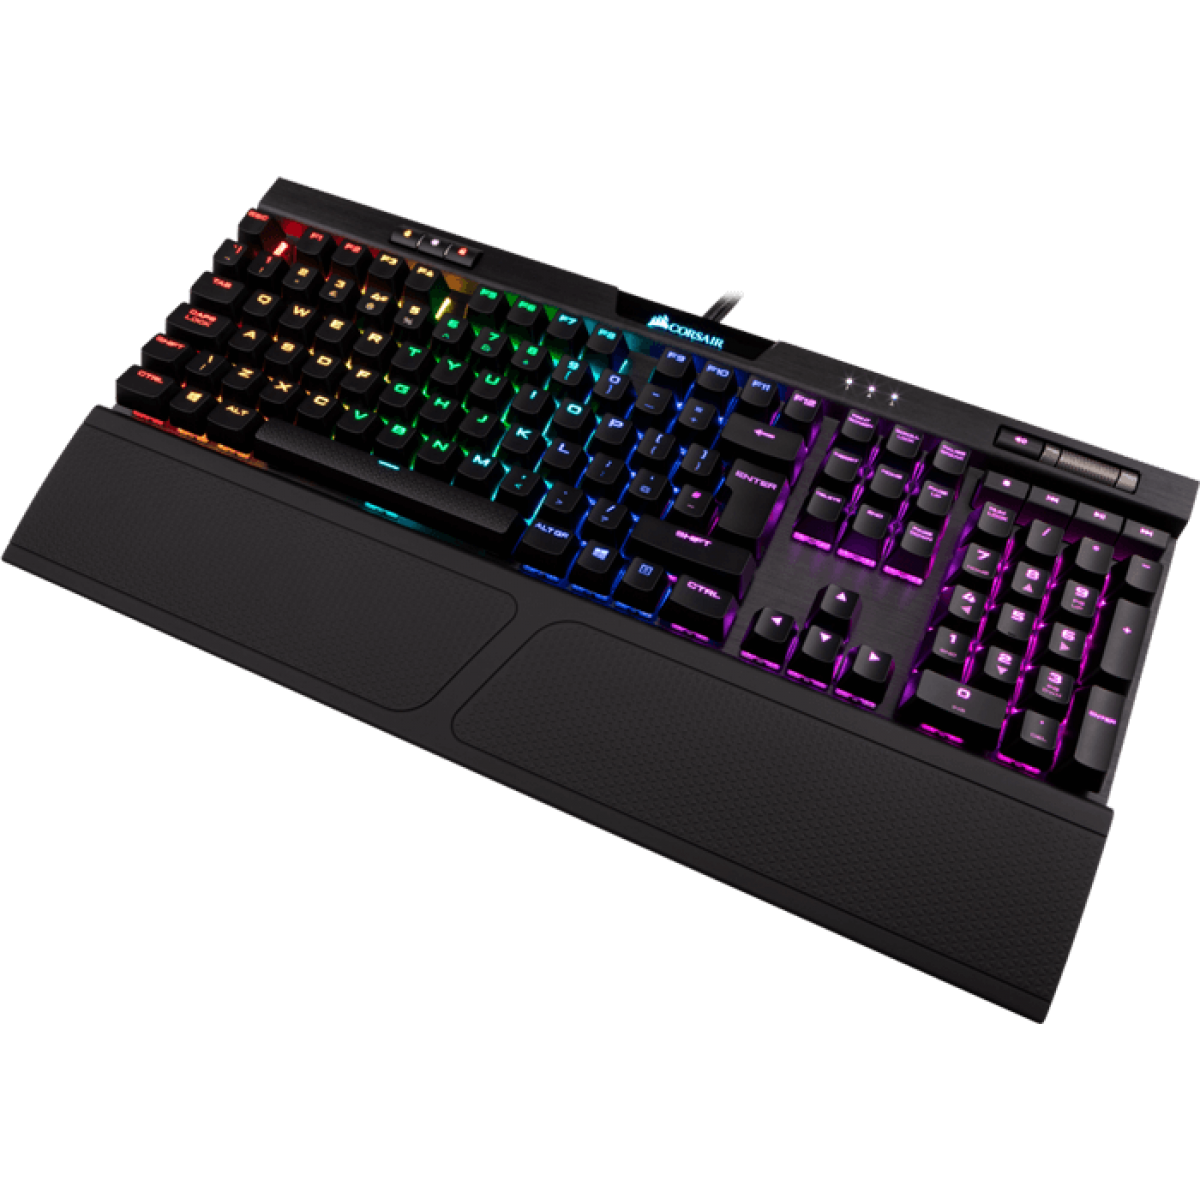 Teclado Mecânico Gamer Corsair K70 RGB MK.2, Switch Cherry MX Red, ABNT2, CH-9109010-BR